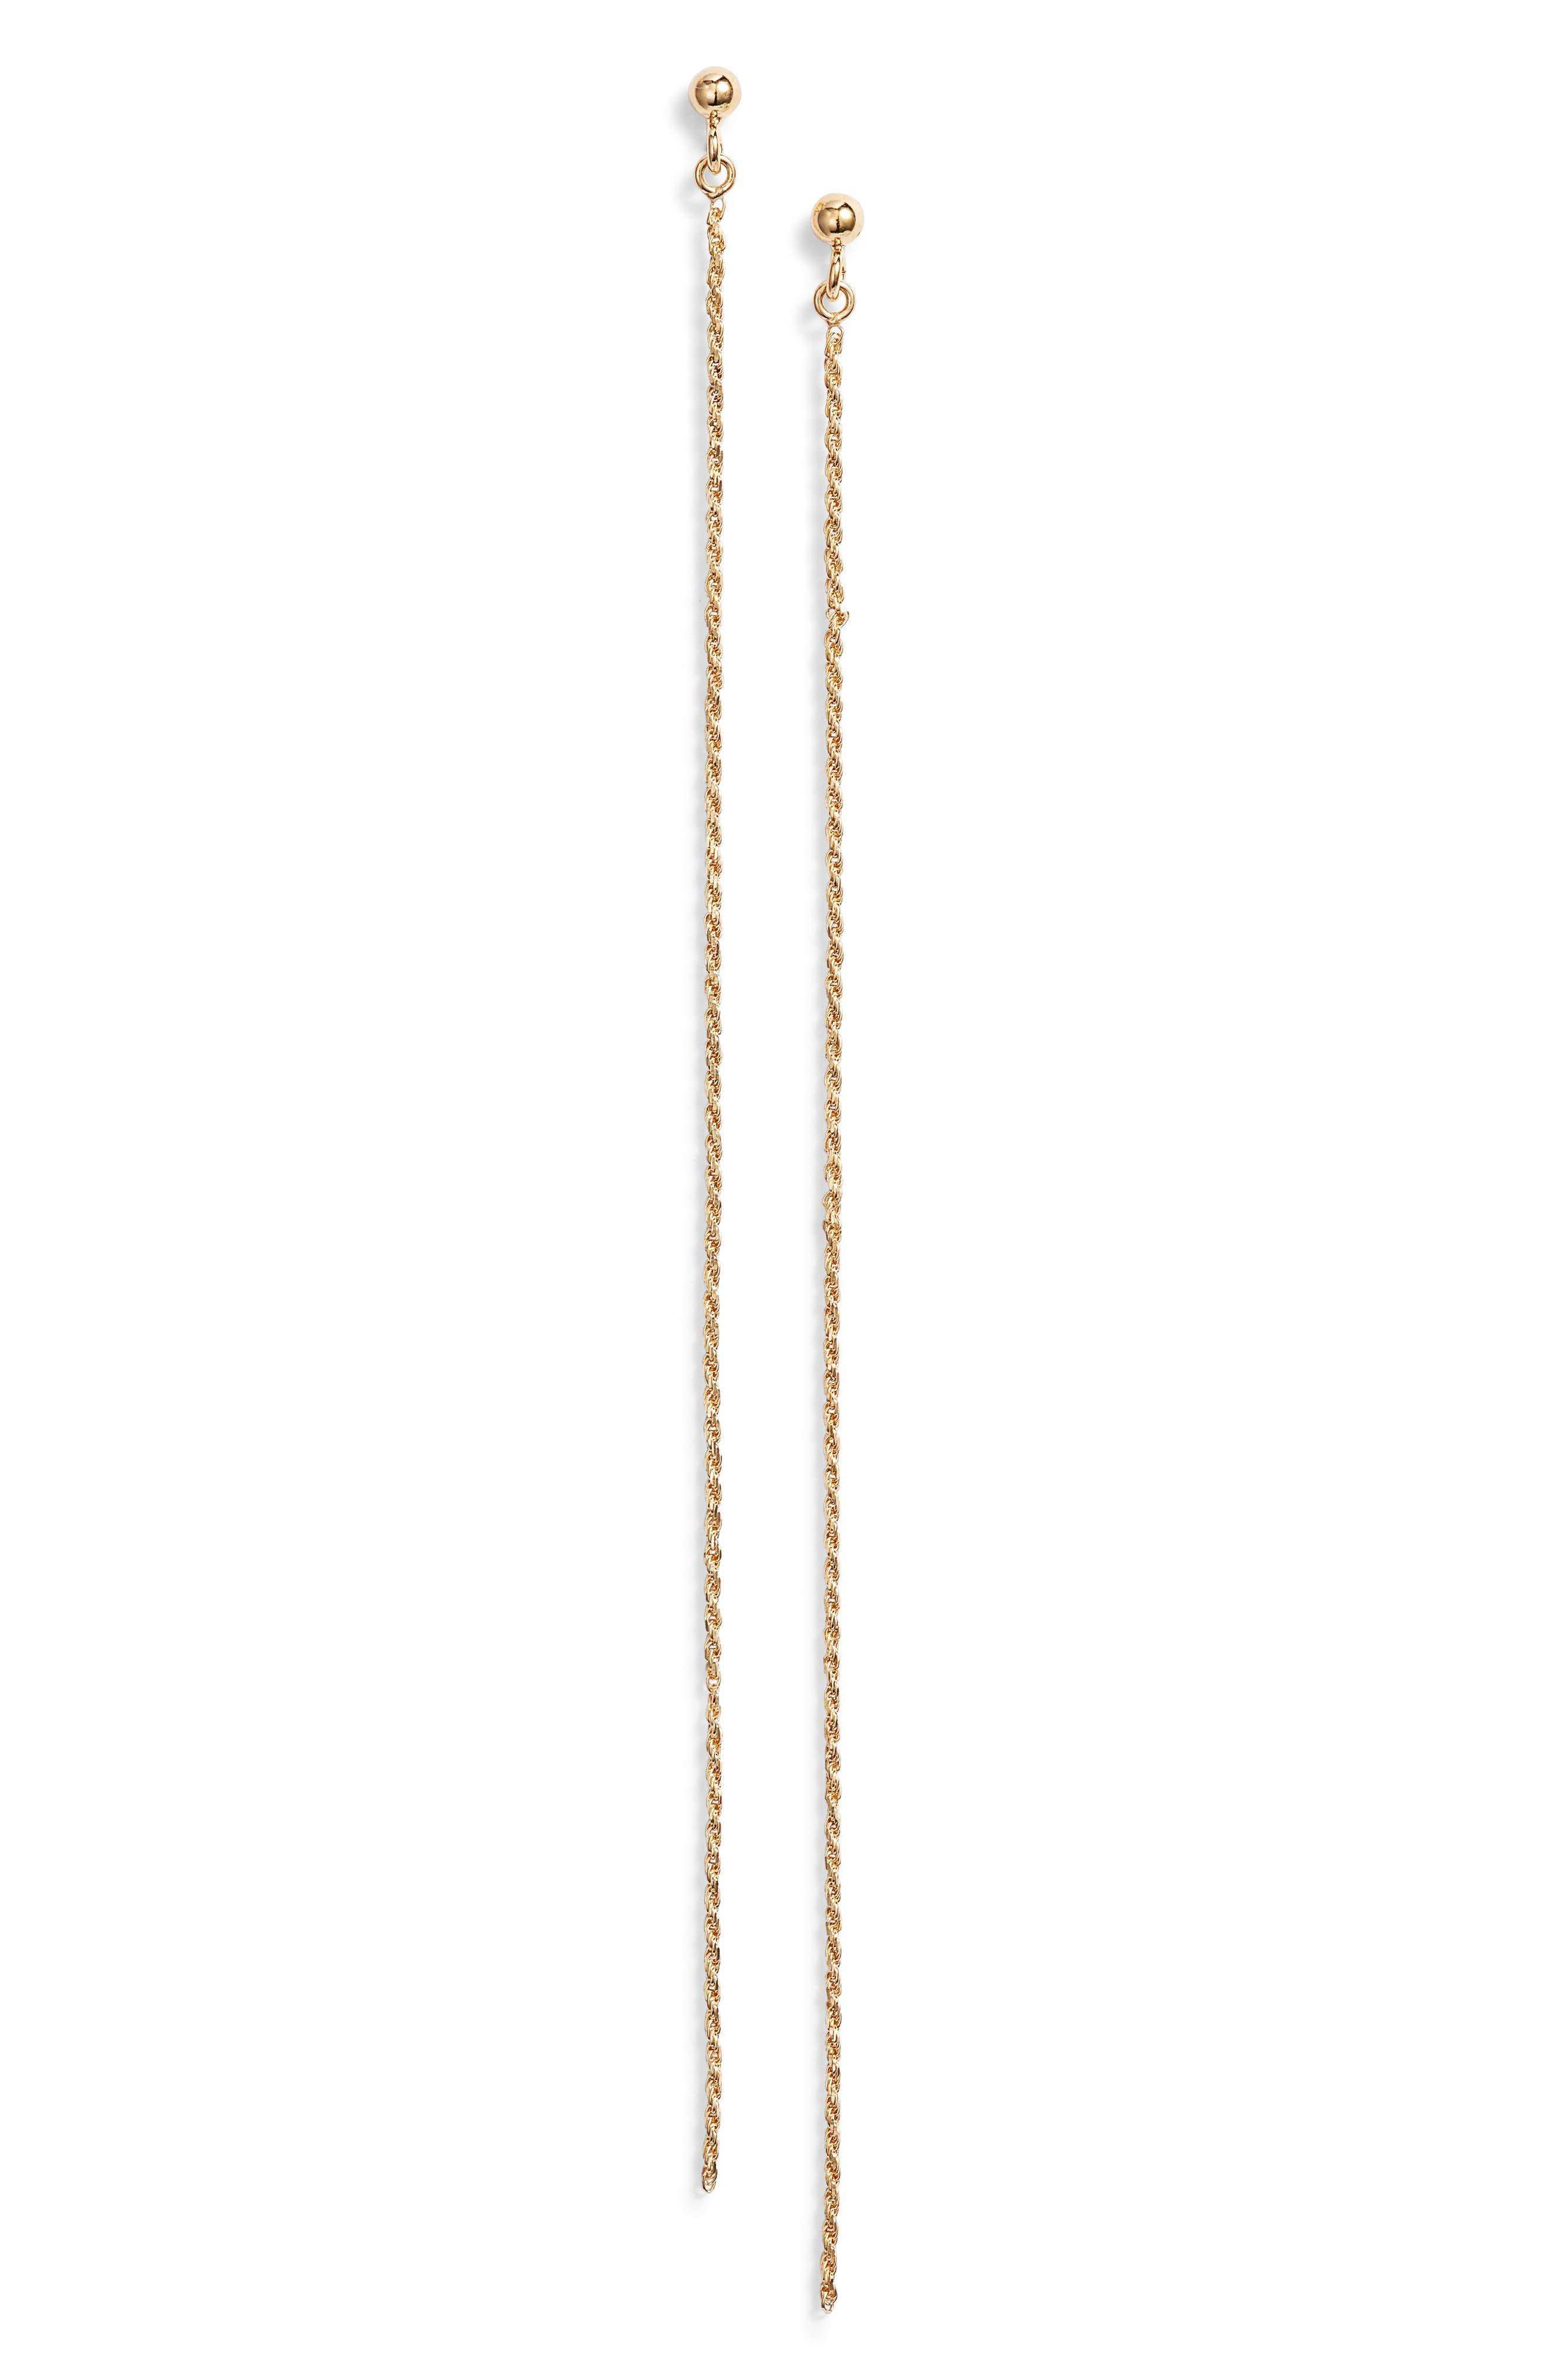 Chain Drop Earrings,                             Main thumbnail 1, color,                             GOLD